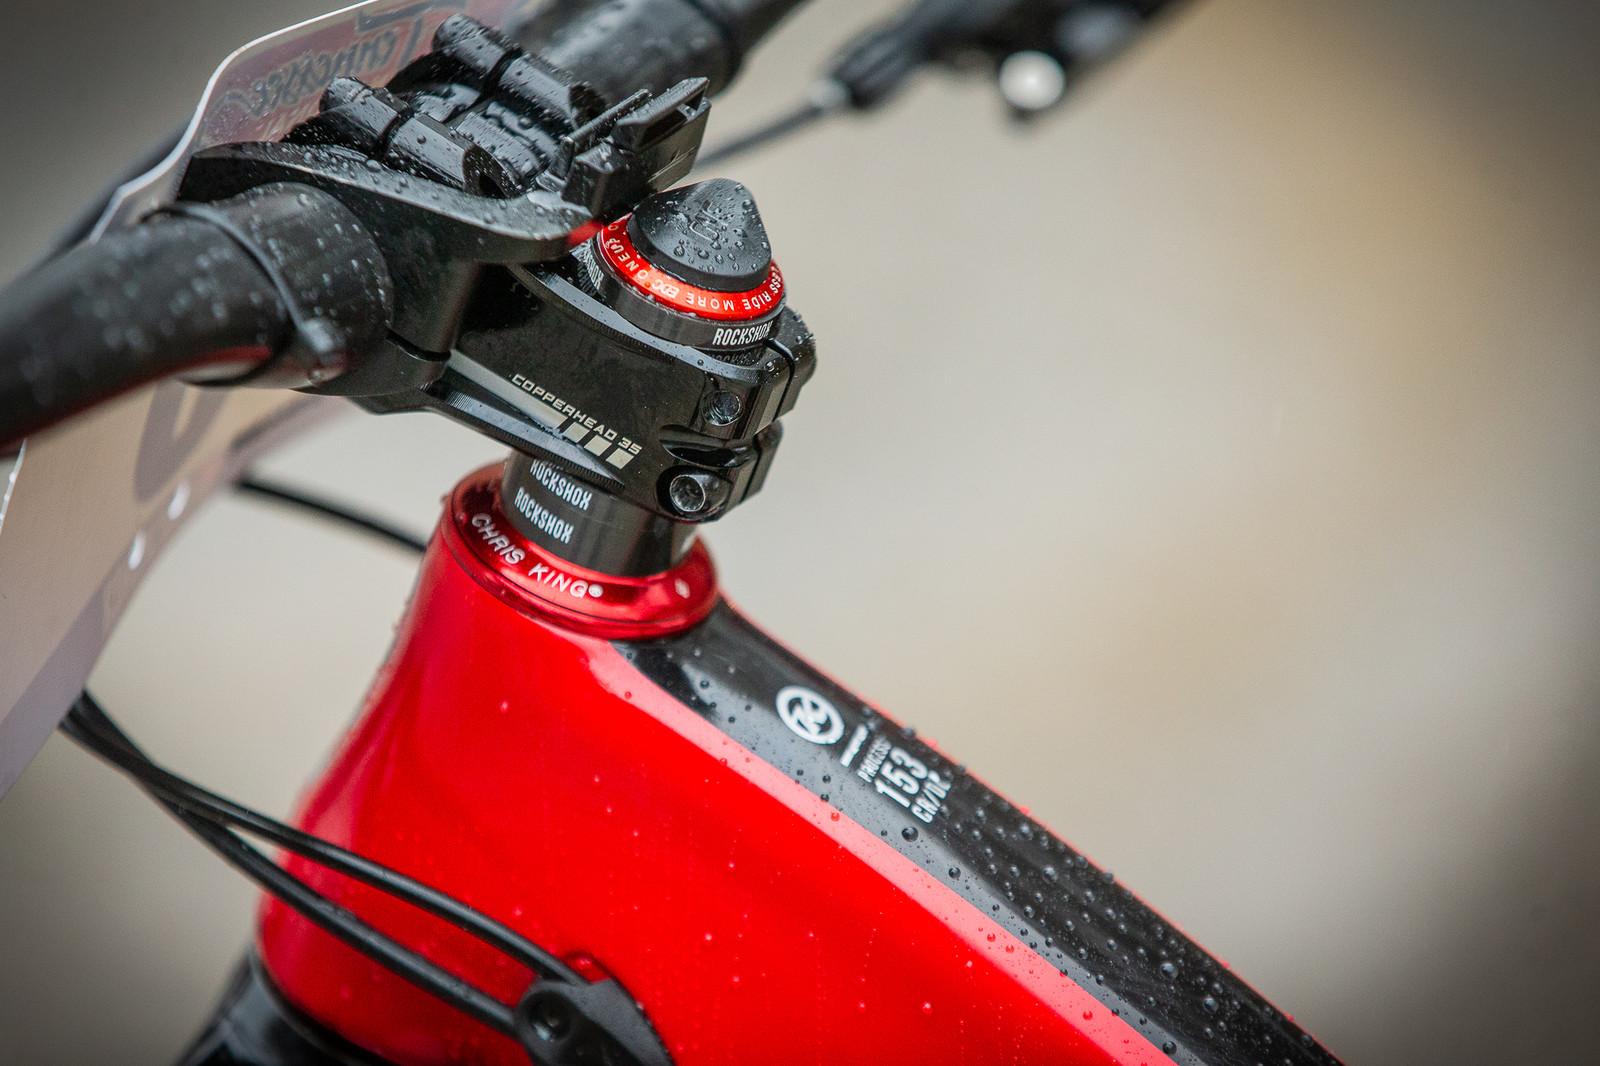 Miranda Miller's Cockpit - PIT BITS - 2019 Windrock Tennessee National Pro GRT  - Mountain Biking Pictures - Vital MTB